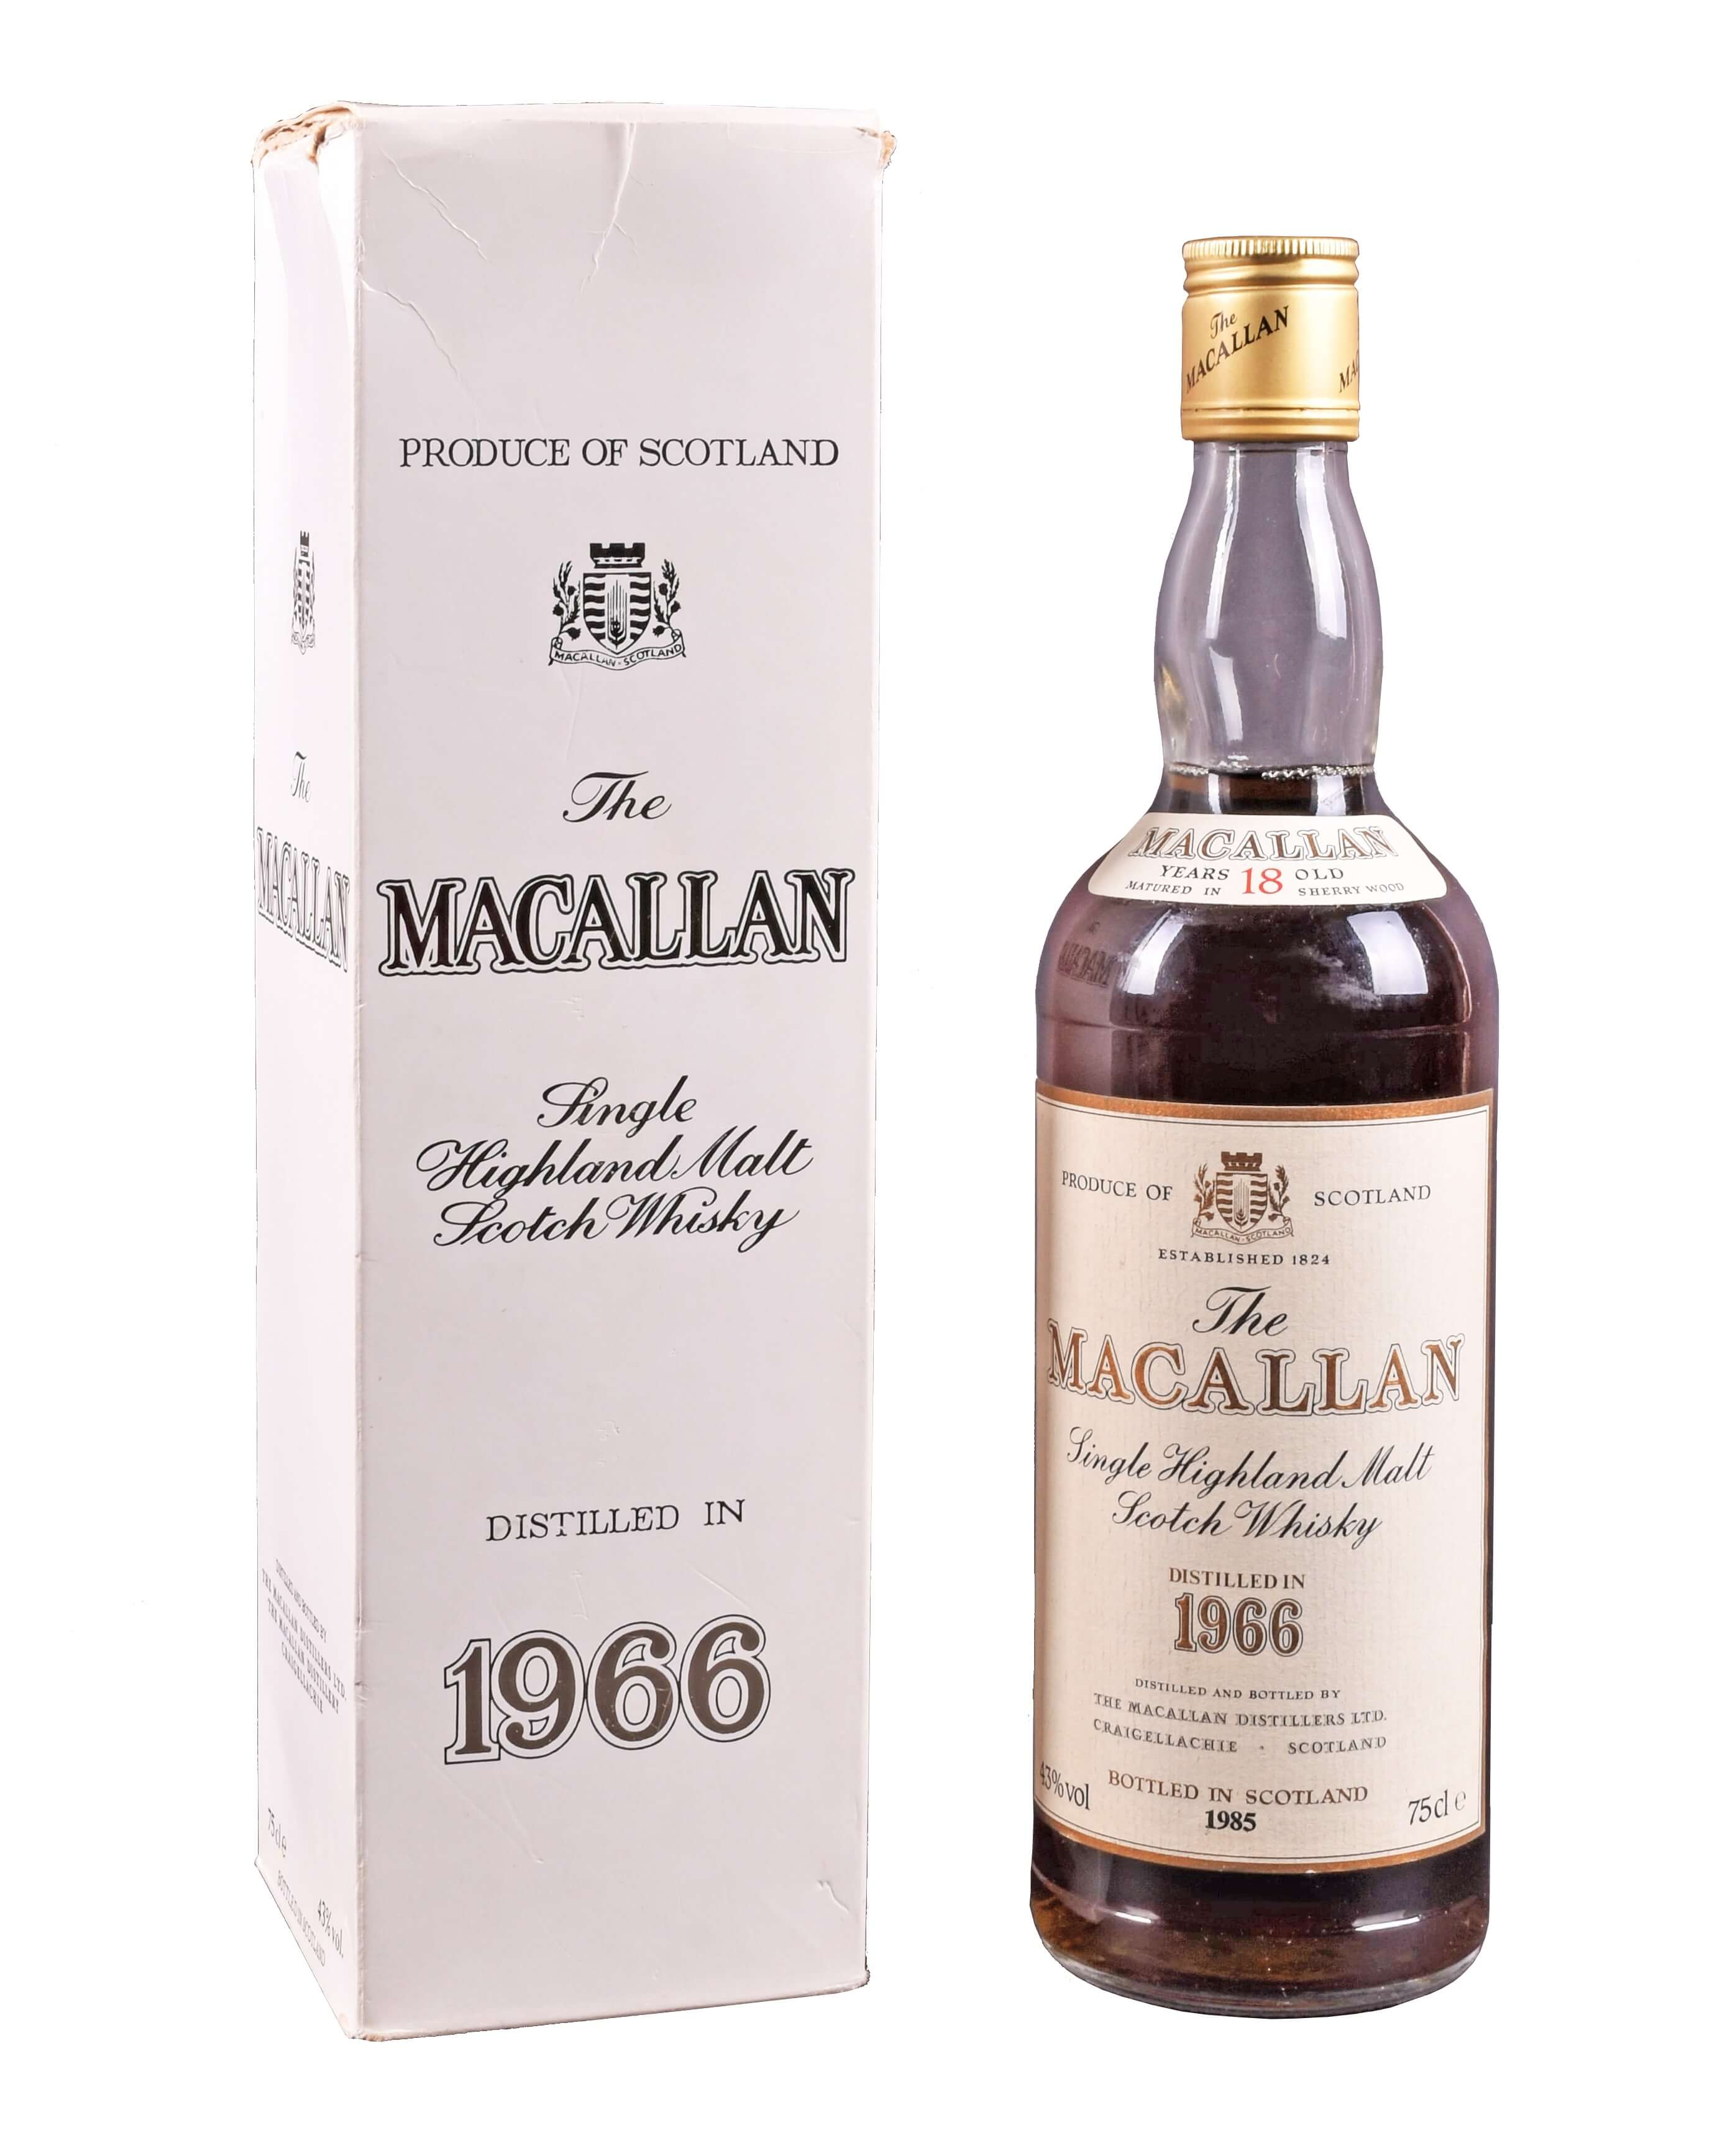 A bottle of 1985 Macallan Single Highland Malt Scotch Whisky. Sold for £1,900.